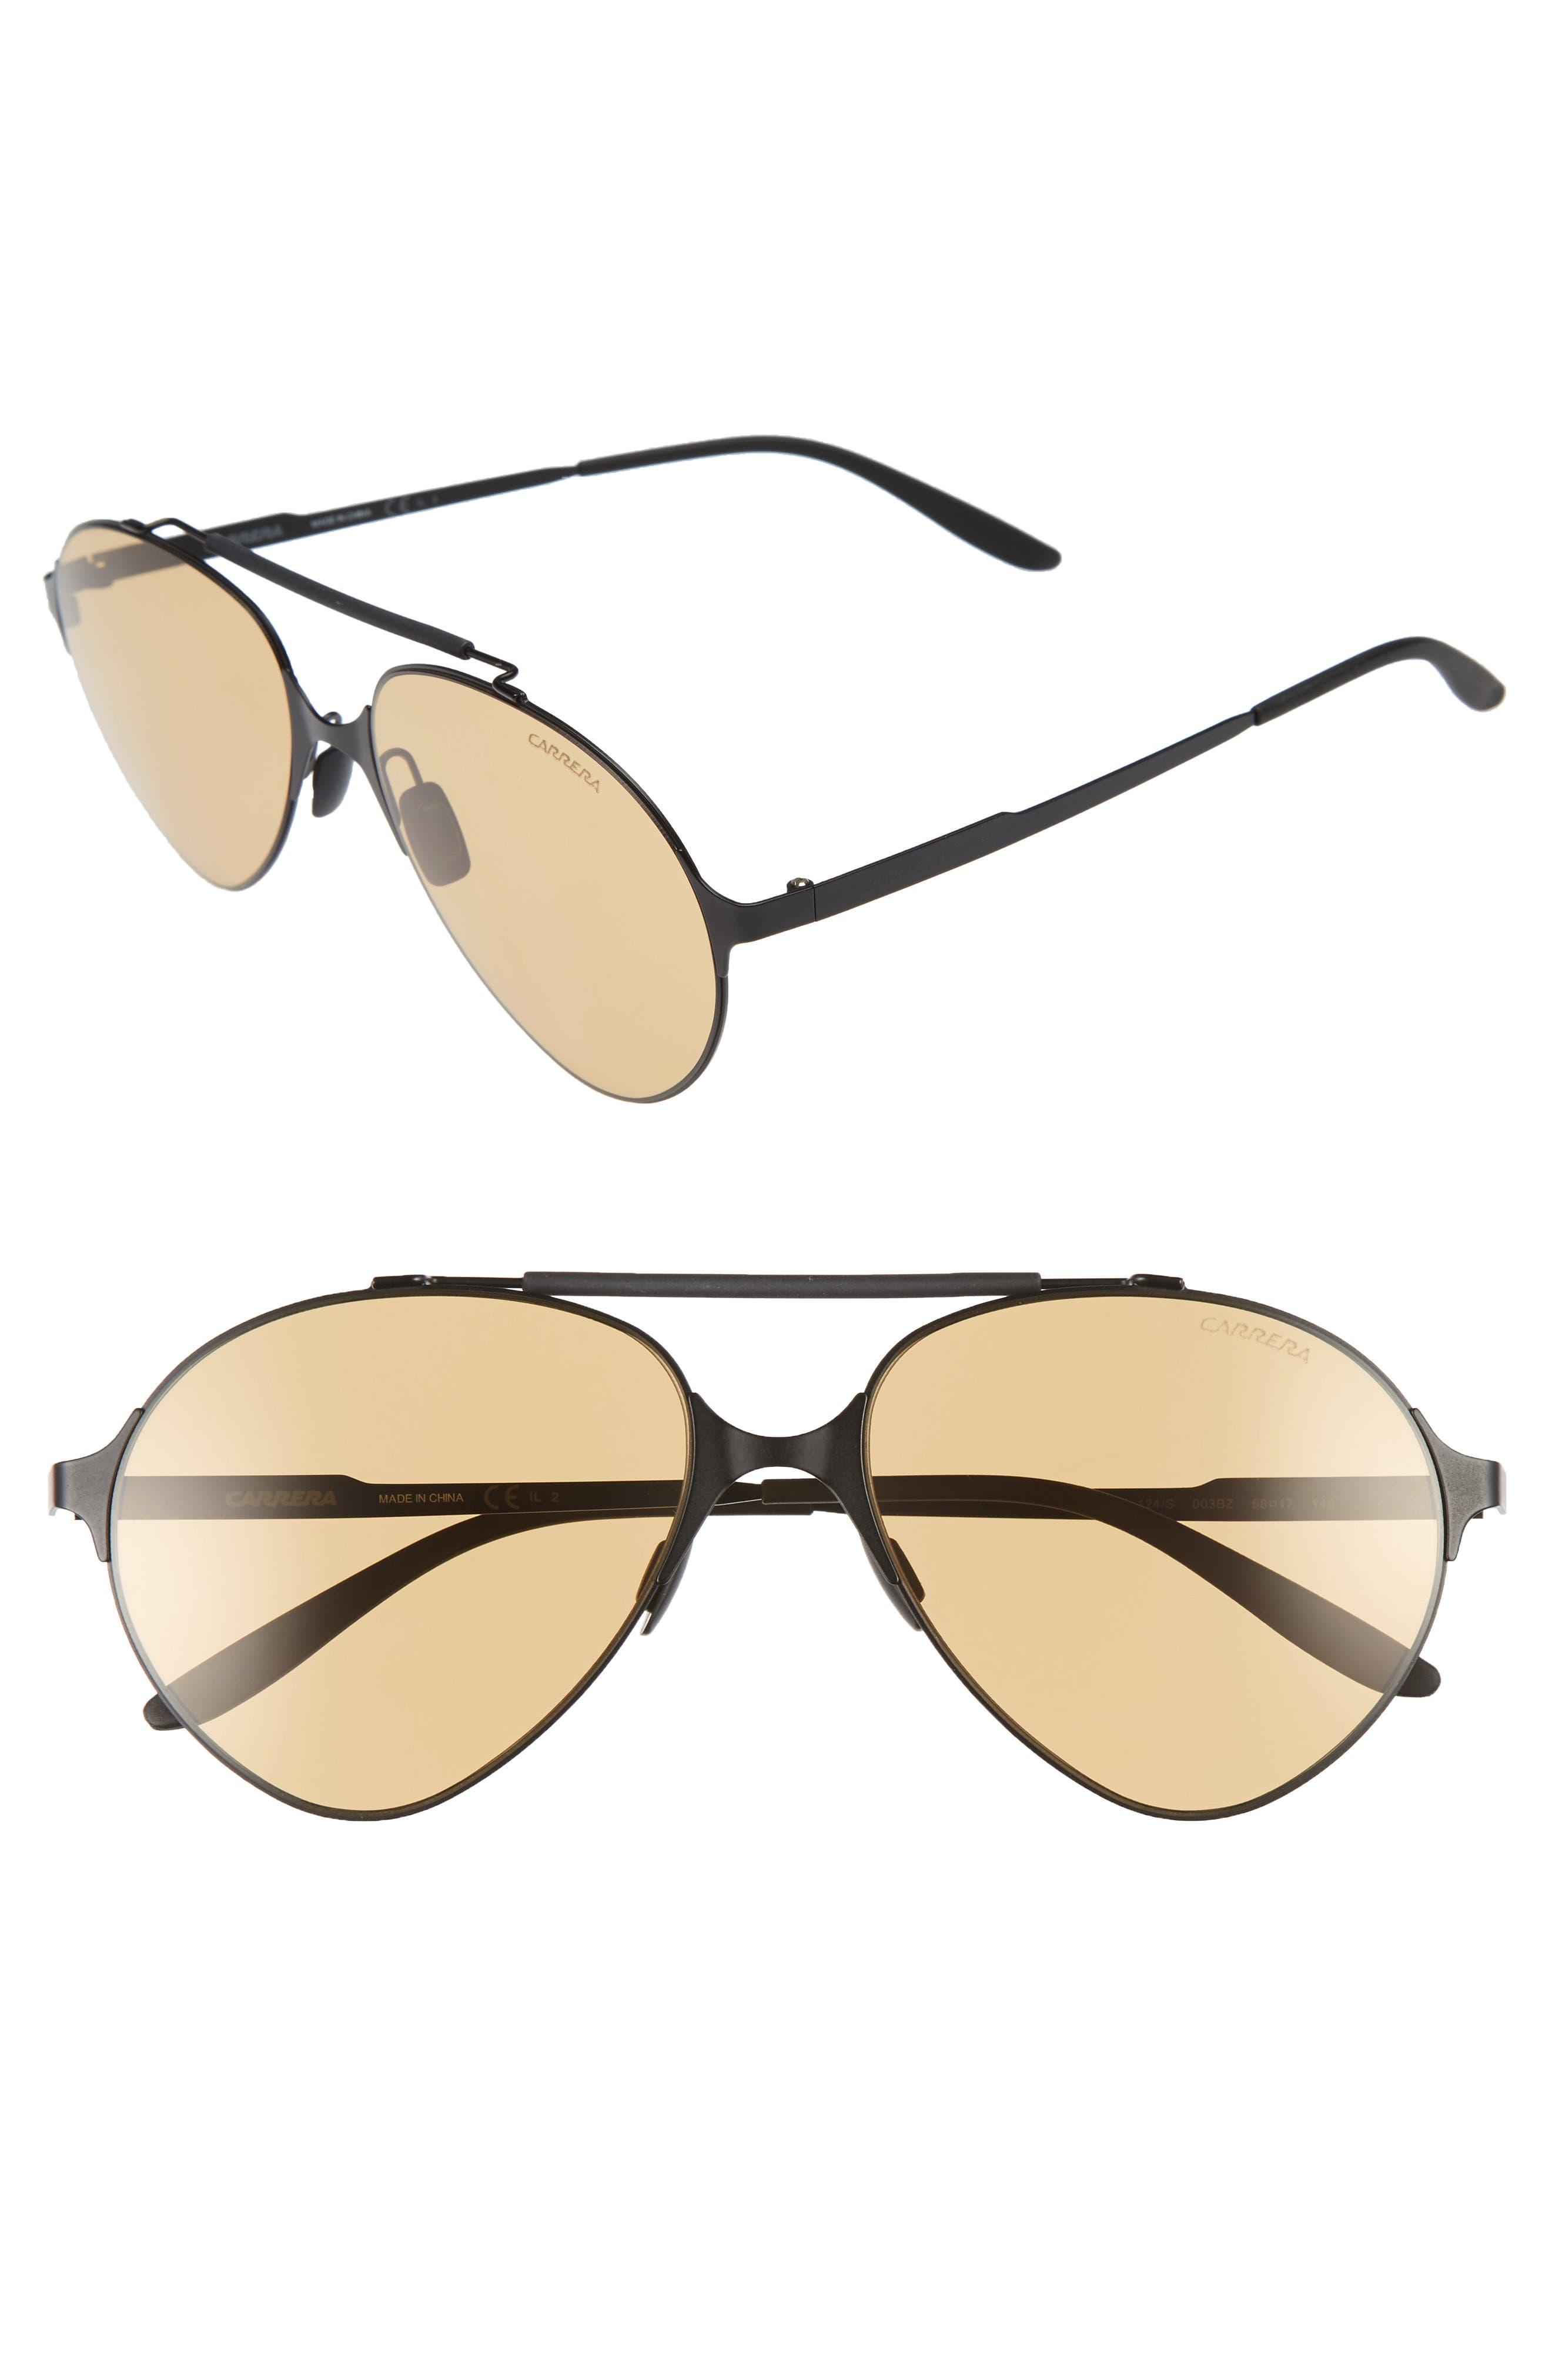 Carrera 58mm Gradient Pilot Sunglasses,                             Main thumbnail 1, color,                             001